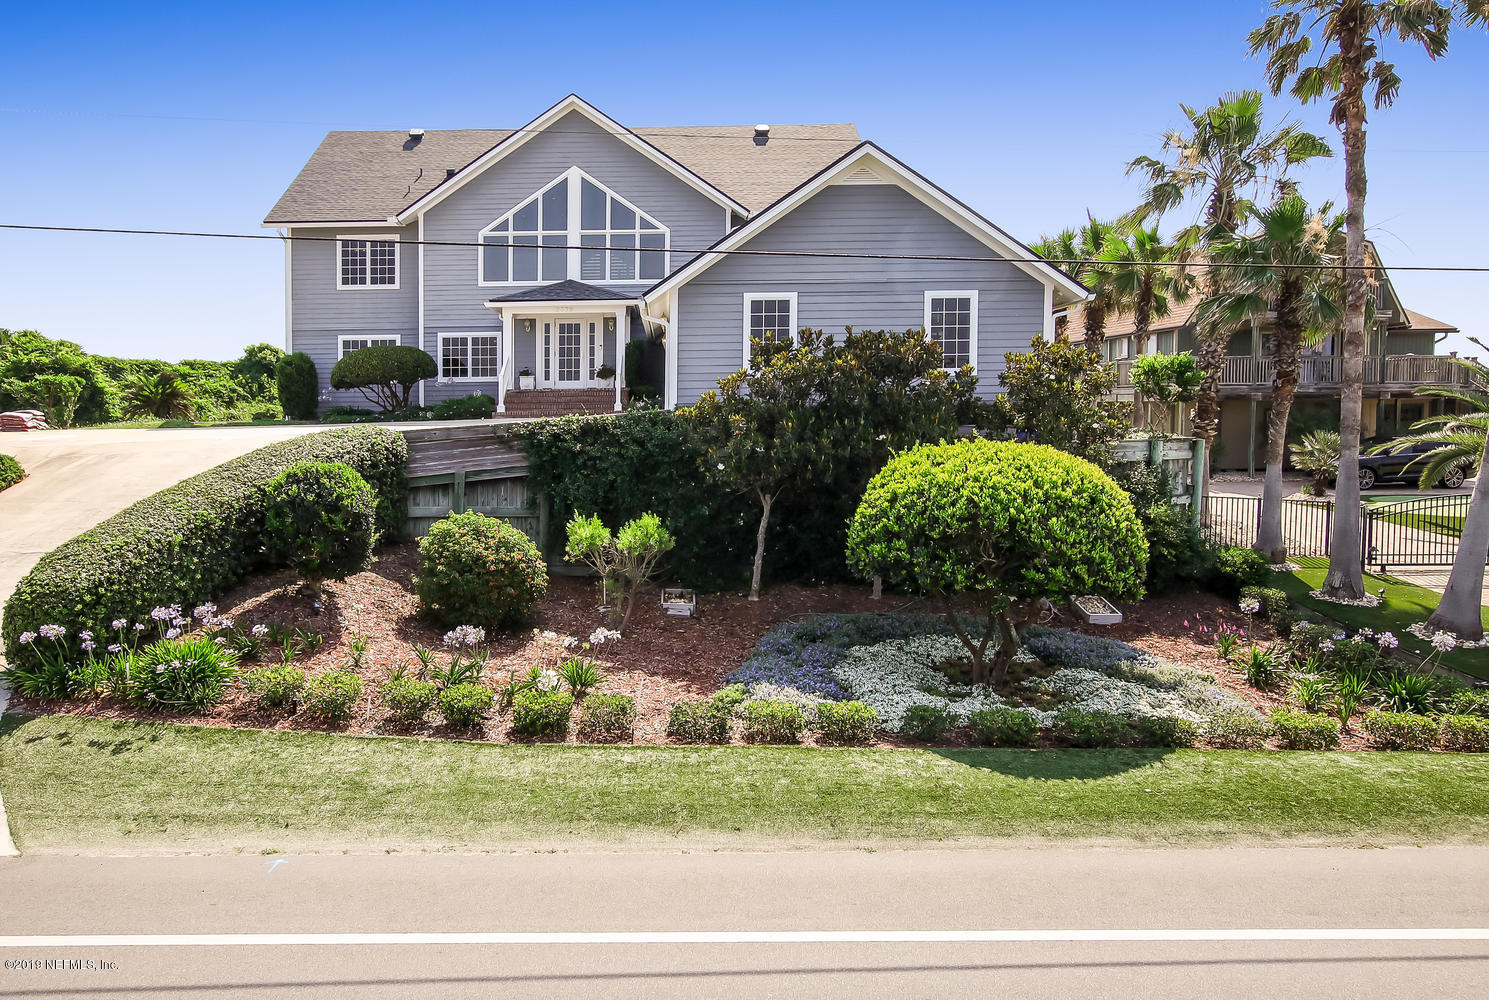 2379 PONTE VEDRA, PONTE VEDRA BEACH, FLORIDA 32082, 7 Bedrooms Bedrooms, ,7 BathroomsBathrooms,Residential,For sale,PONTE VEDRA,998161